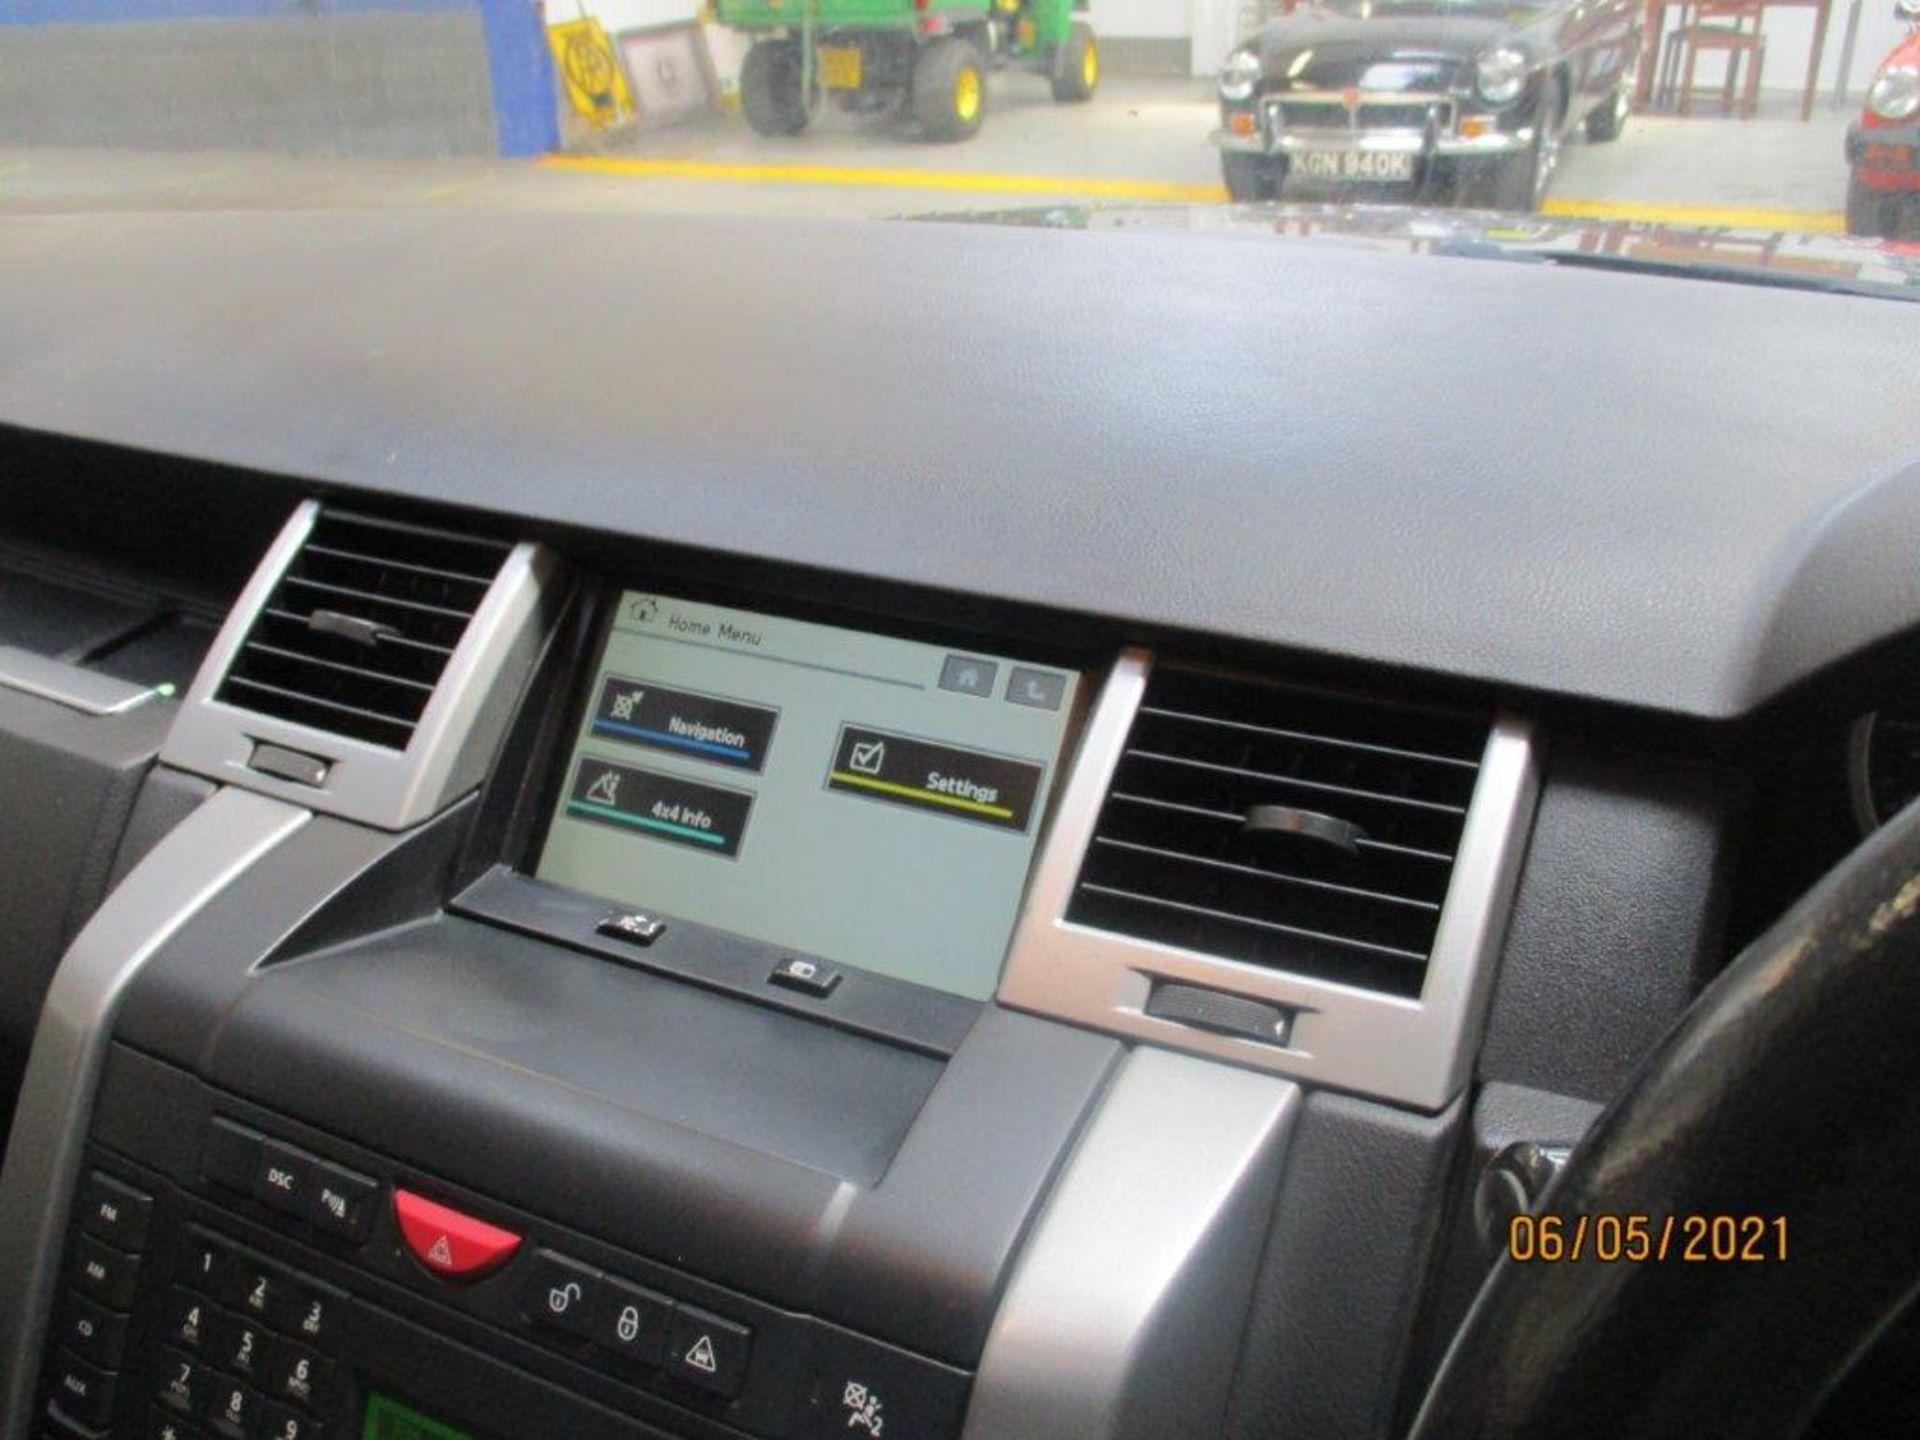 08 08 R/R Sport HSE TDV8 Auto - Image 9 of 19